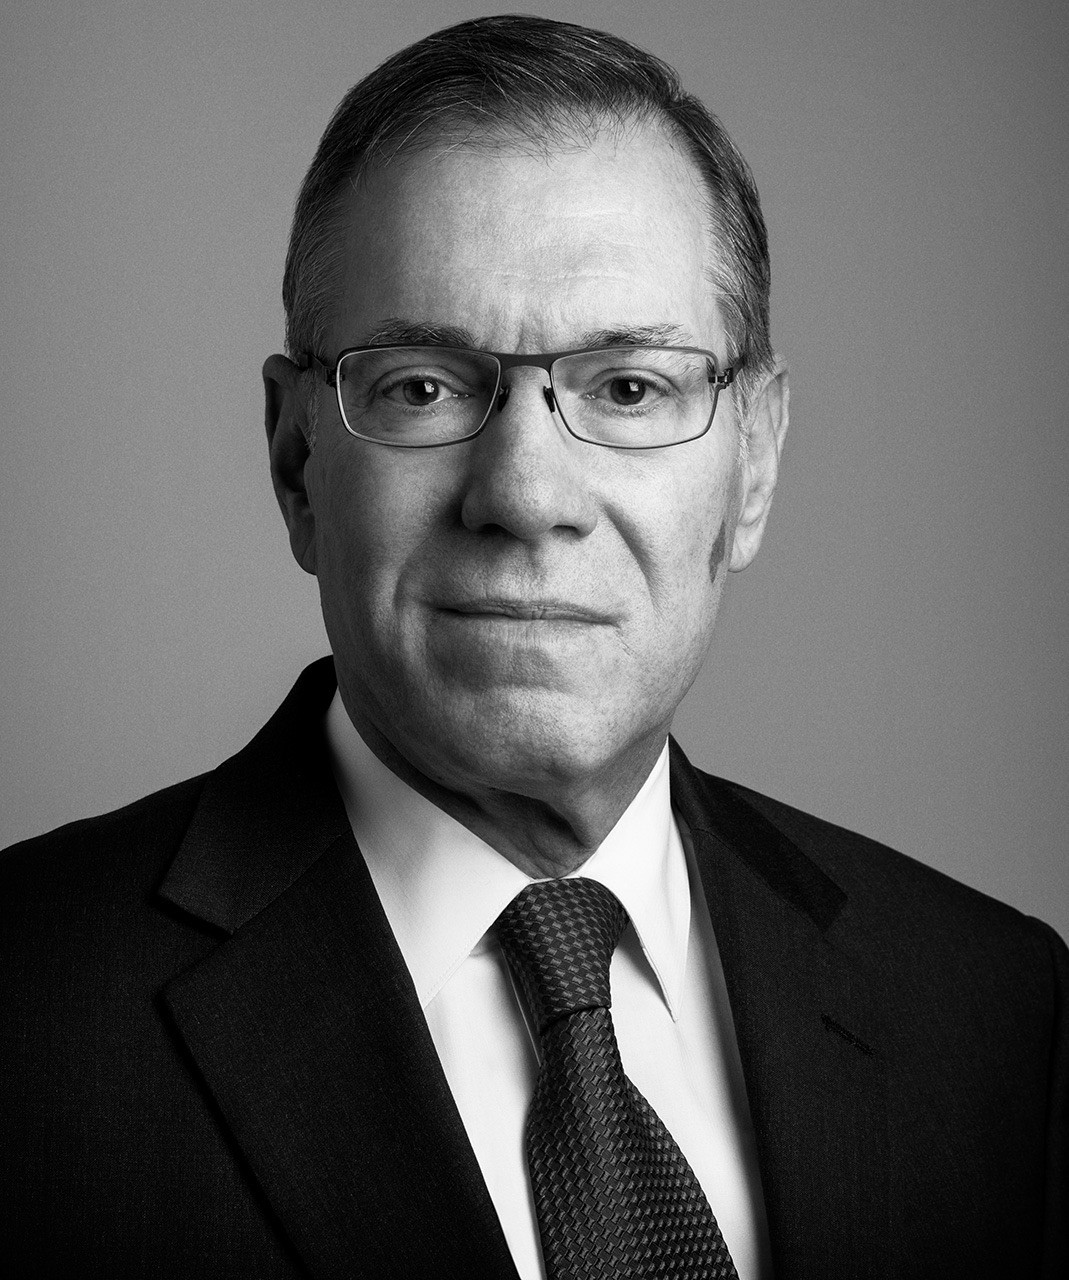 Alan Serrins